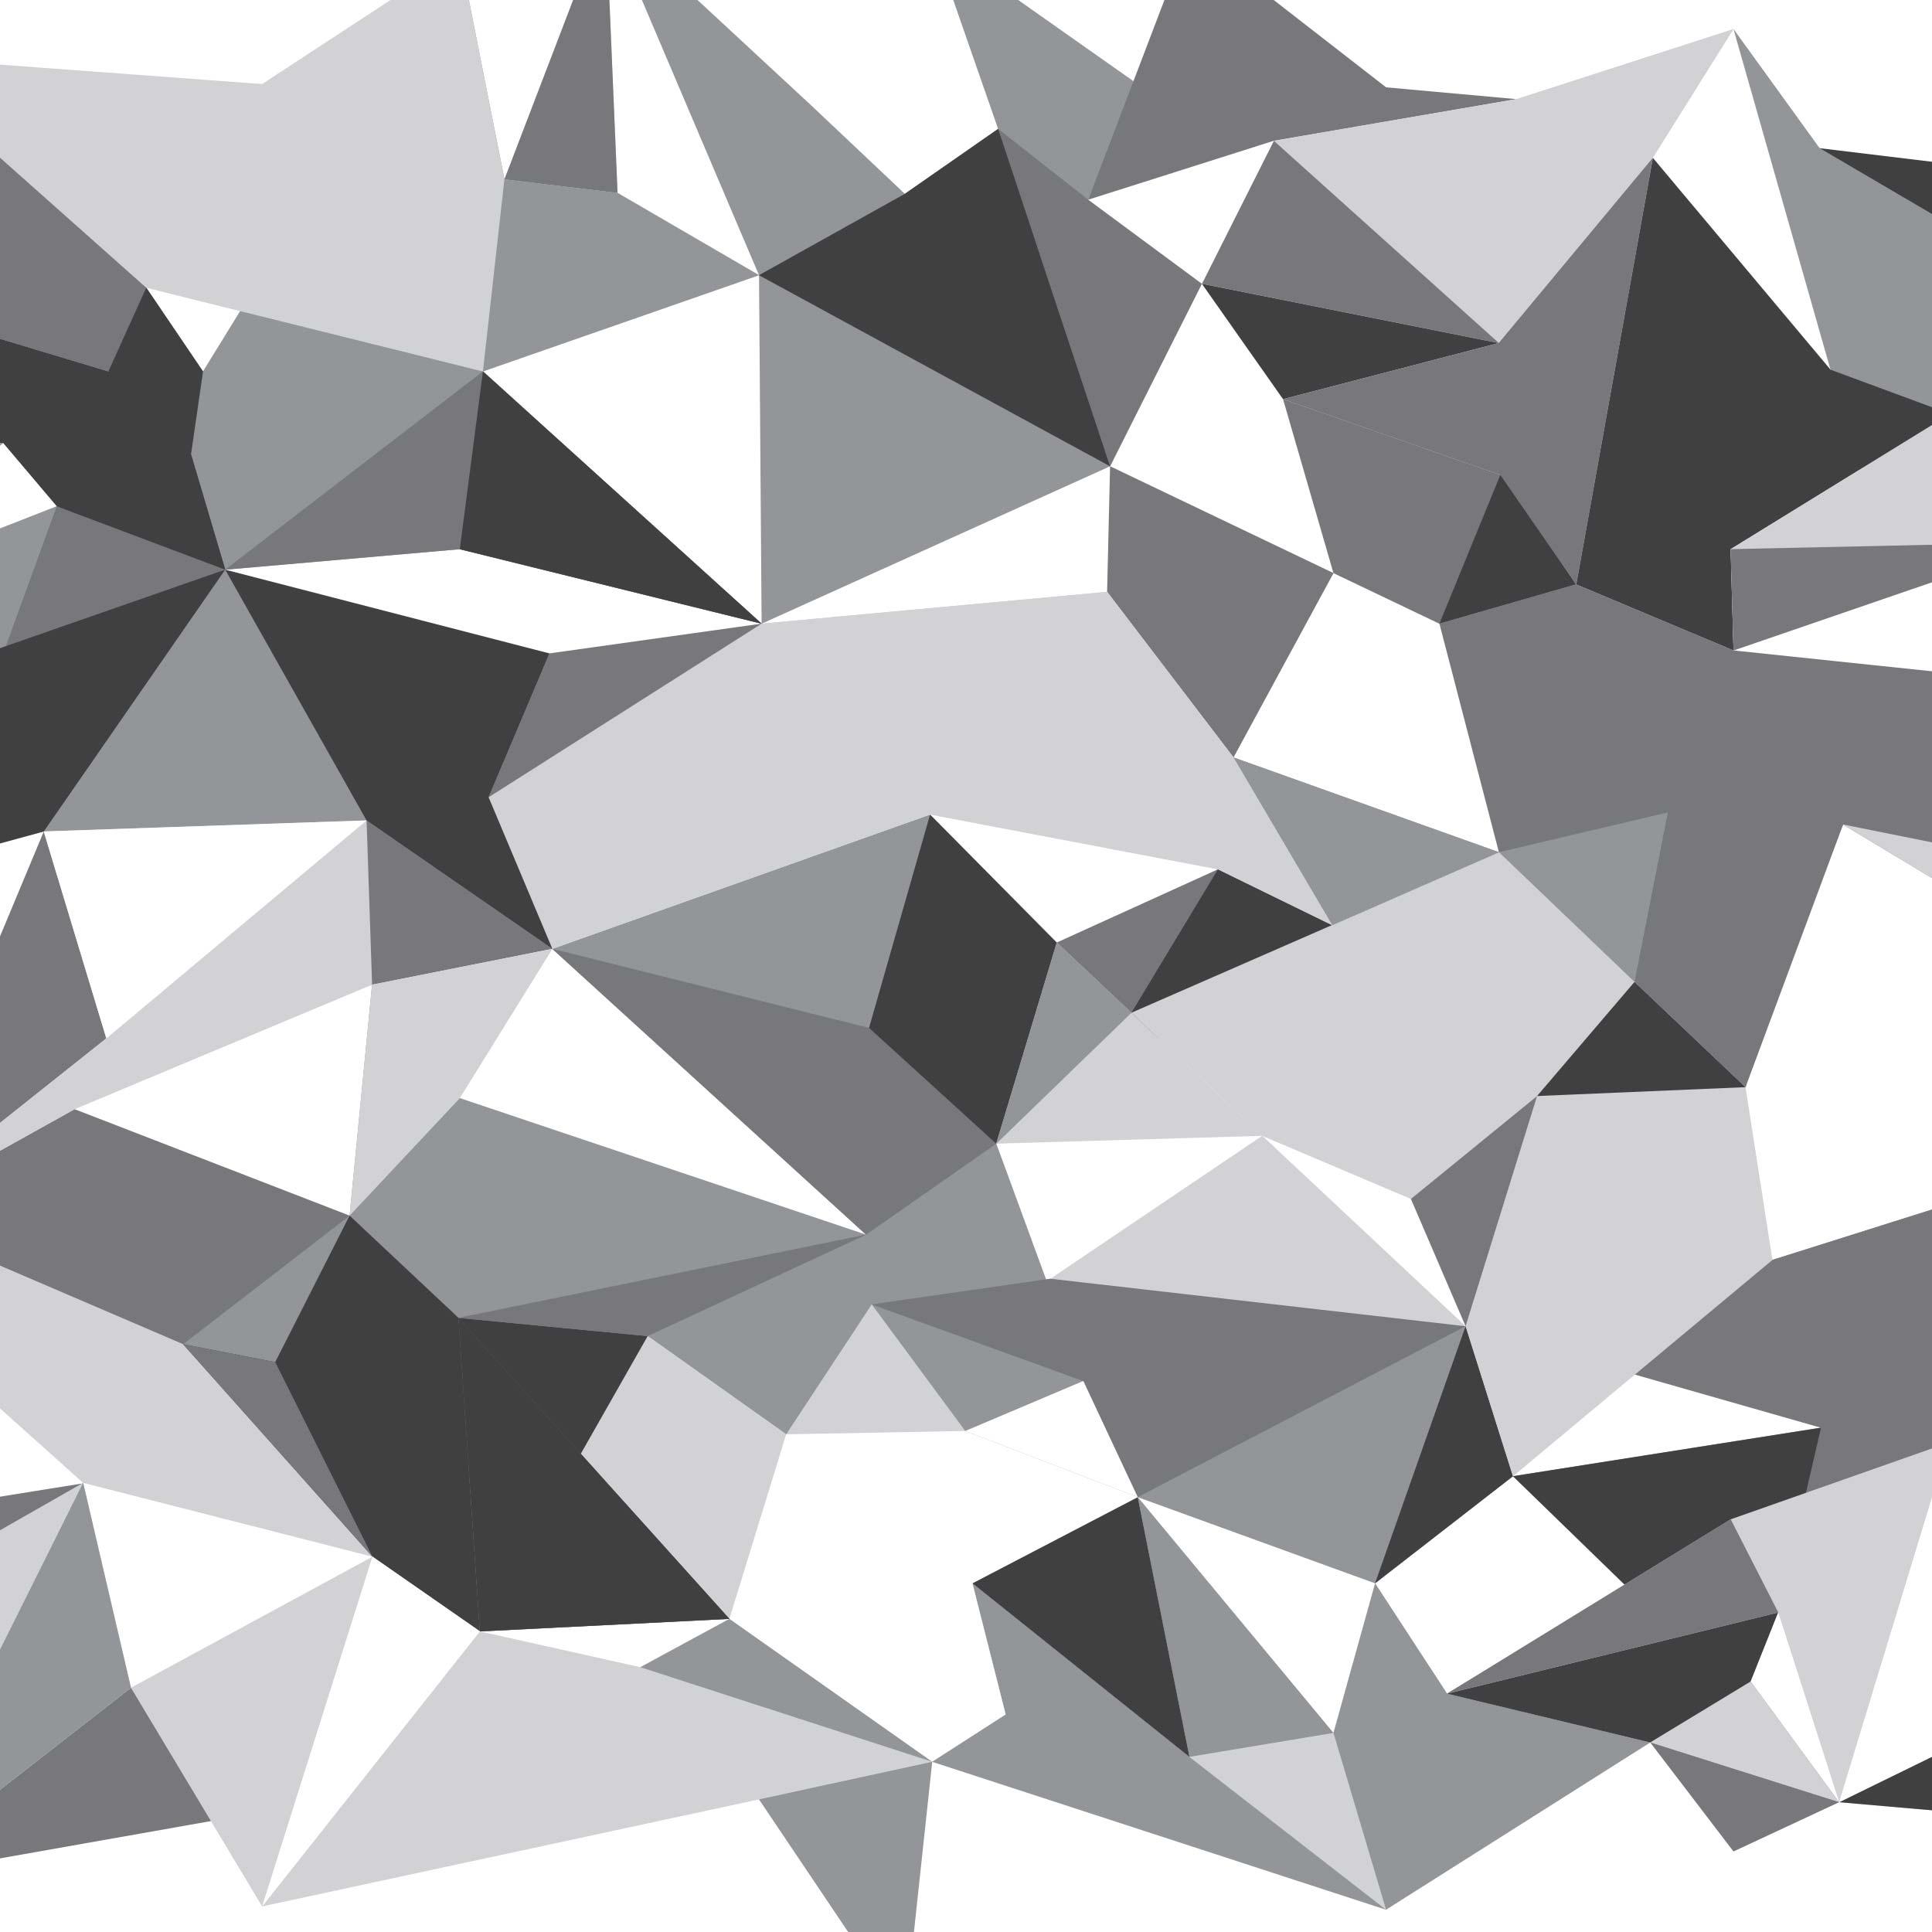 Design-pages_04.jpg